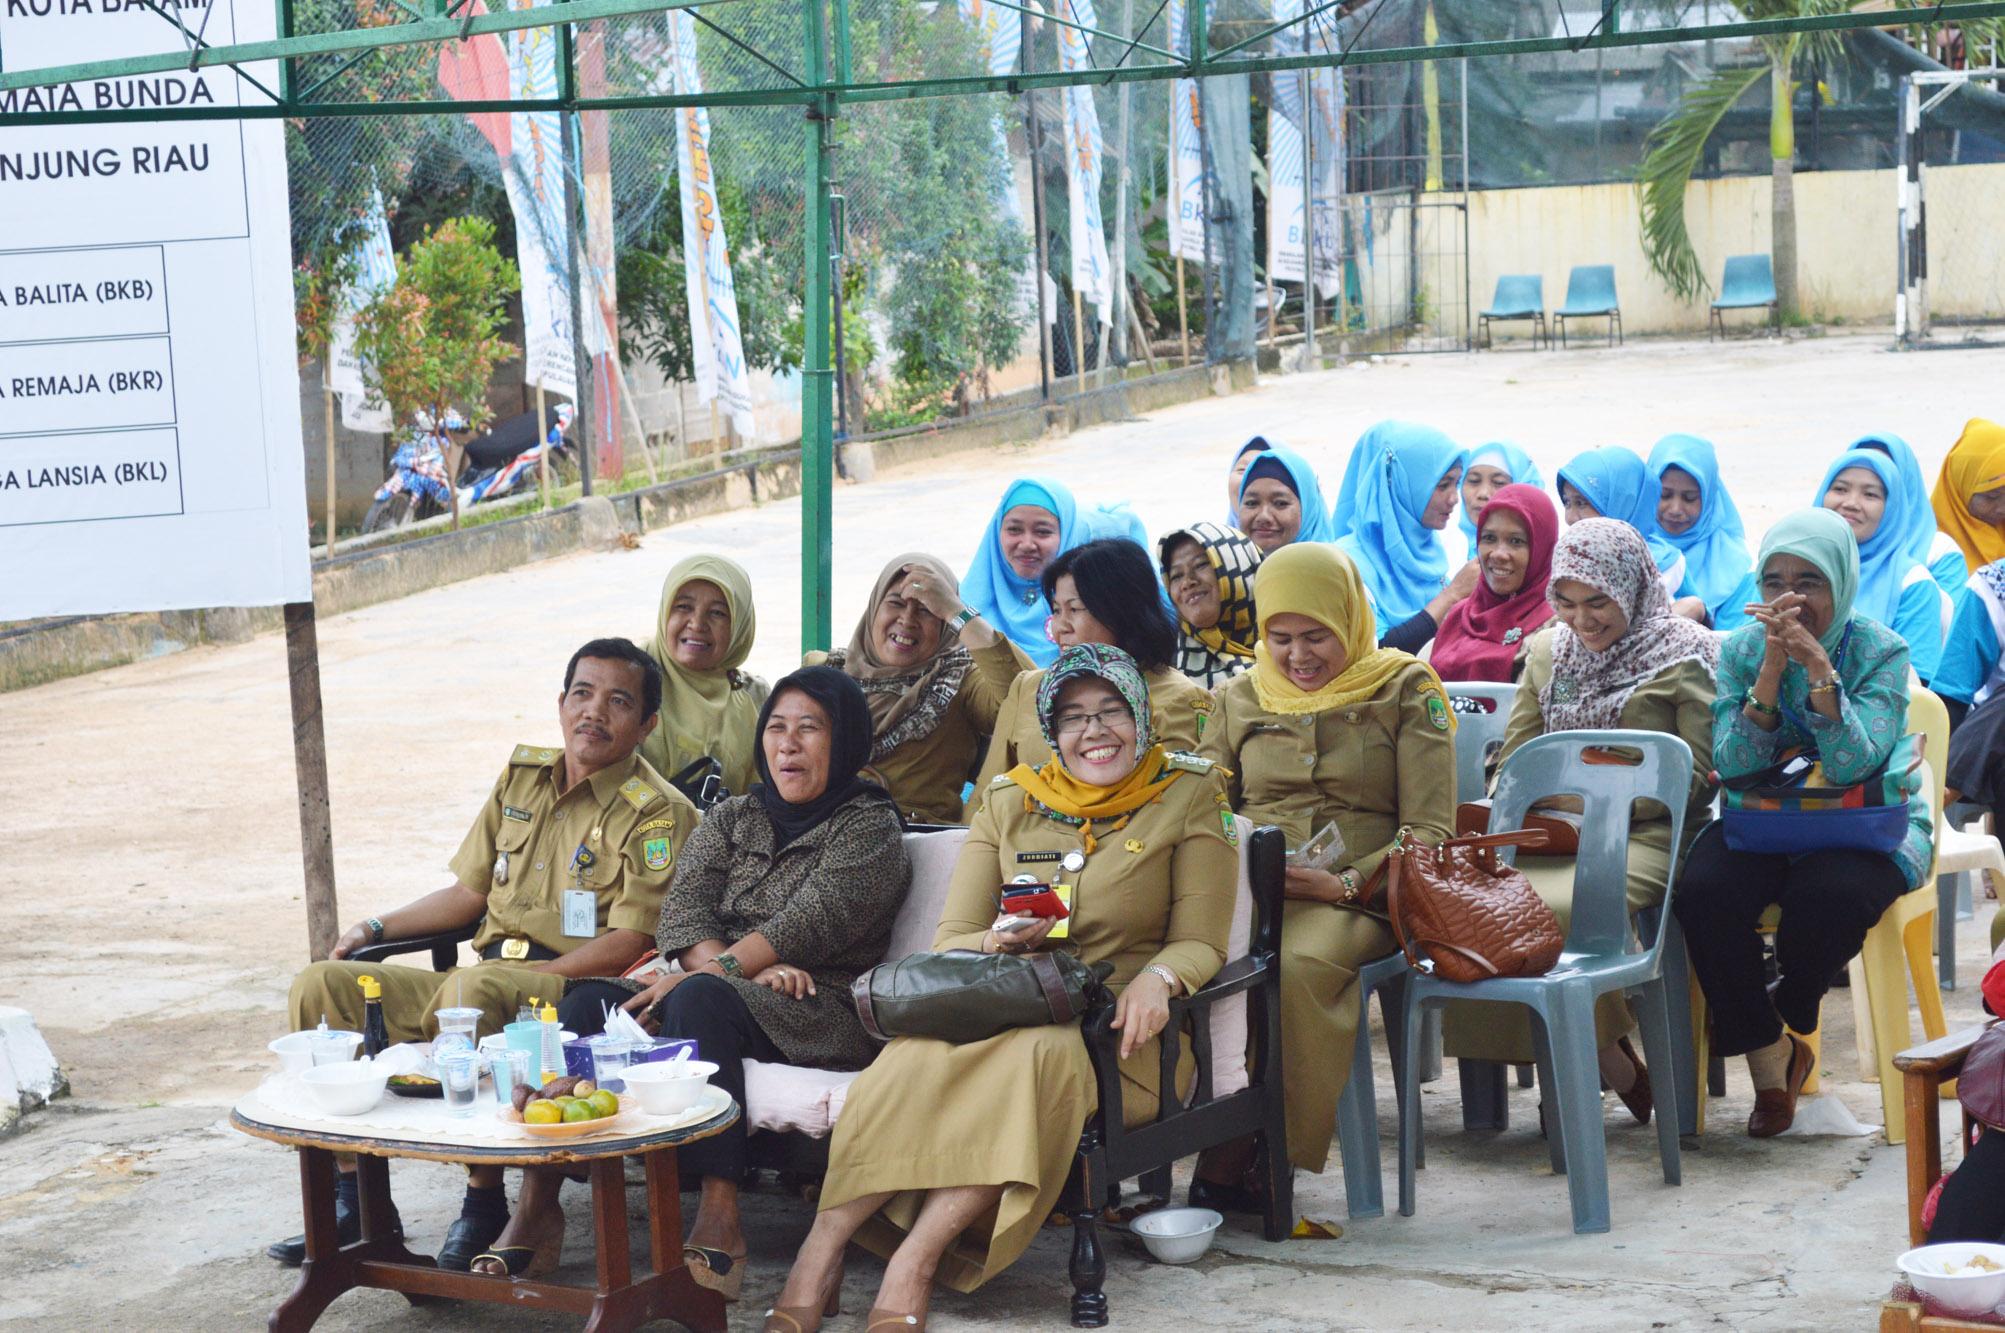 Sixth image of Kegiatan Pkk Peduli Sasar 11 Kecamatan Di Kepulauan with 14 « November « 2014 « WEBSITES KECAMATAN SEKUPANG